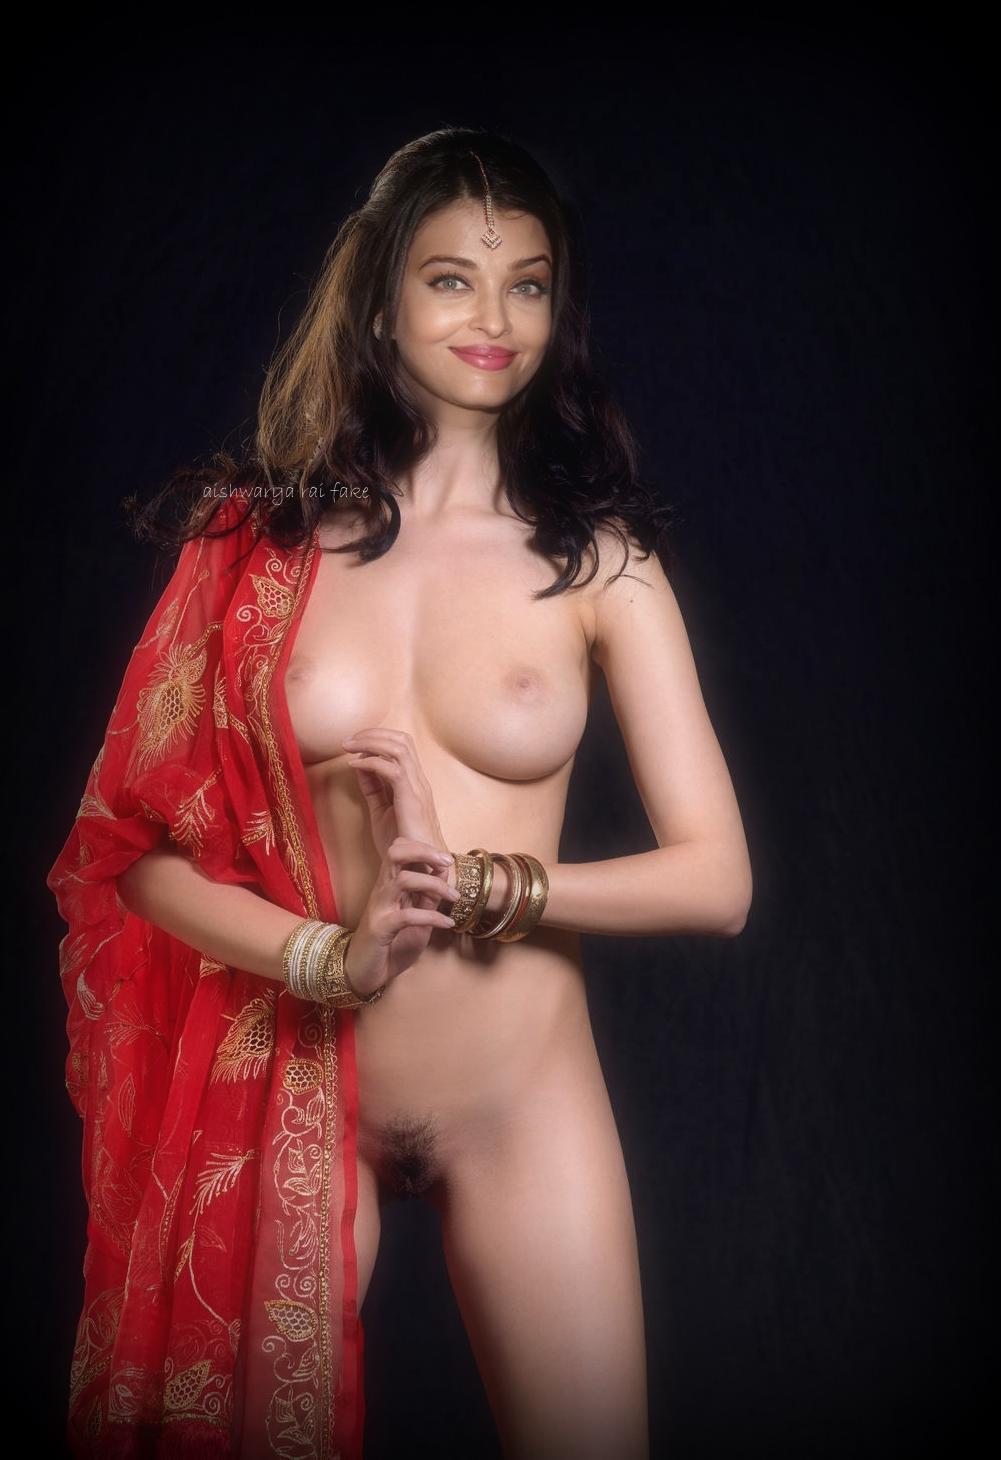 golie-foto-indianki-porno-rus-sasha-blond